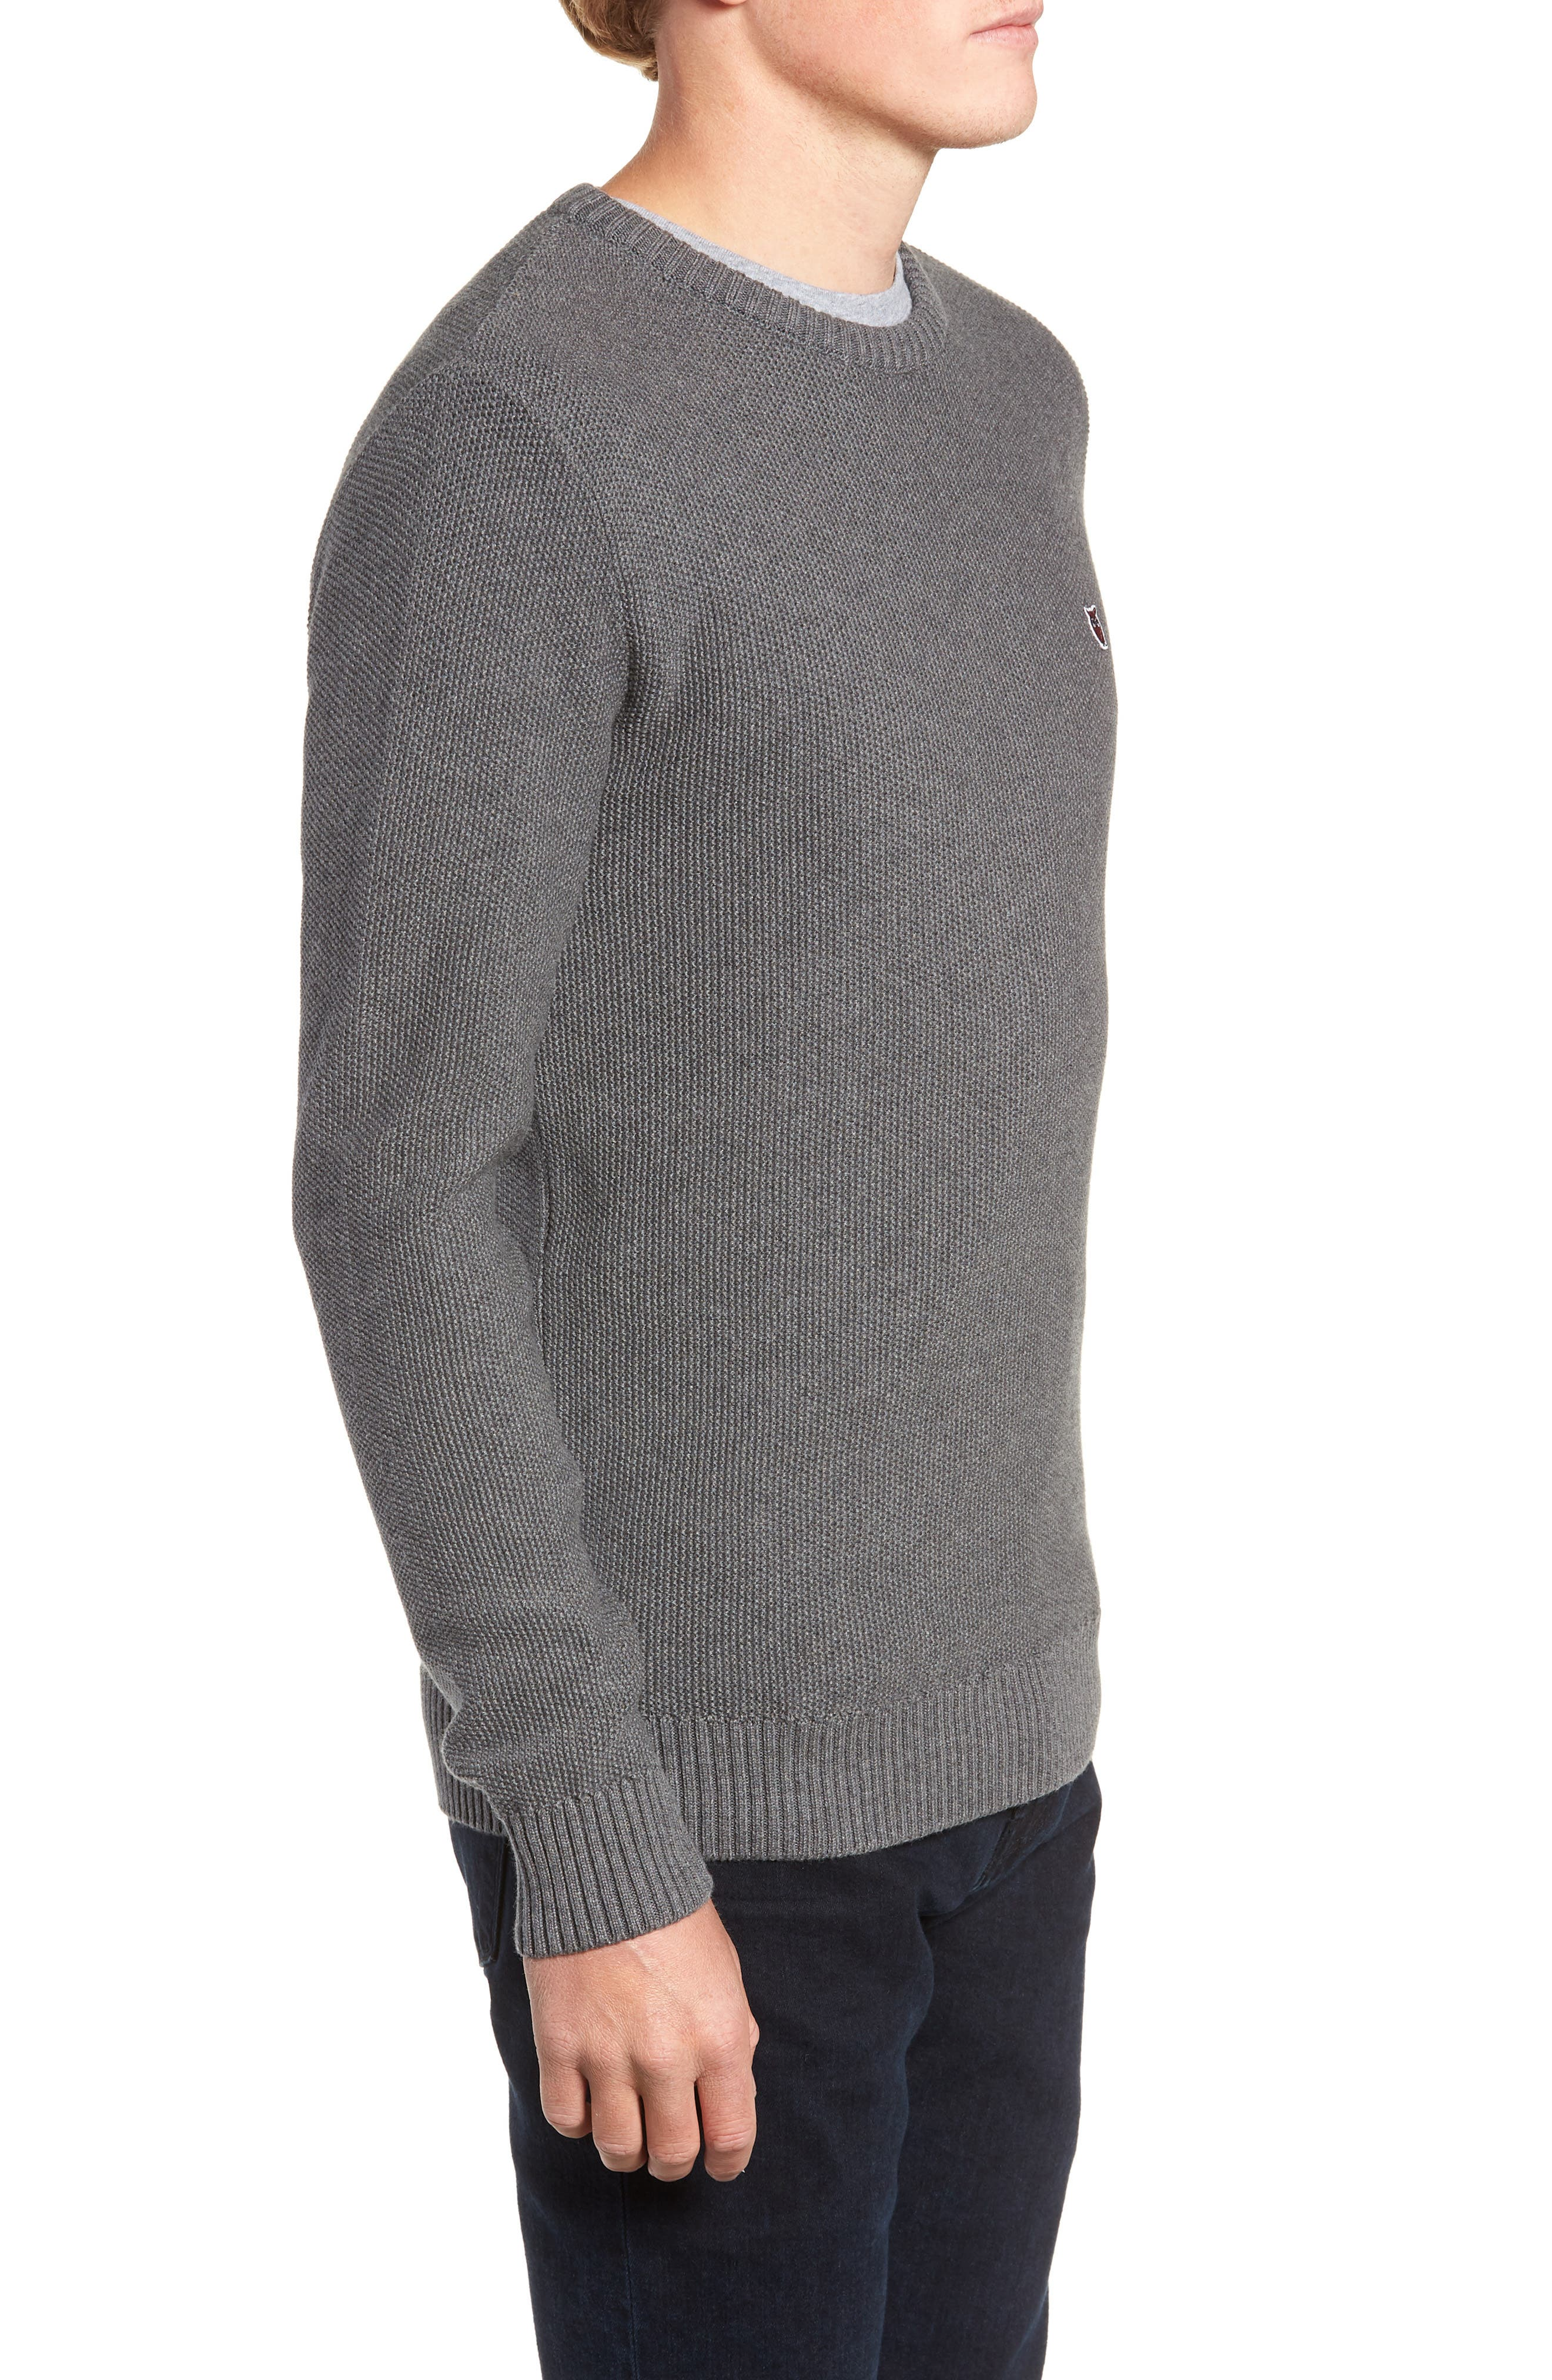 Owl Textured Sweater,                             Alternate thumbnail 3, color,                             GREY MELANGE